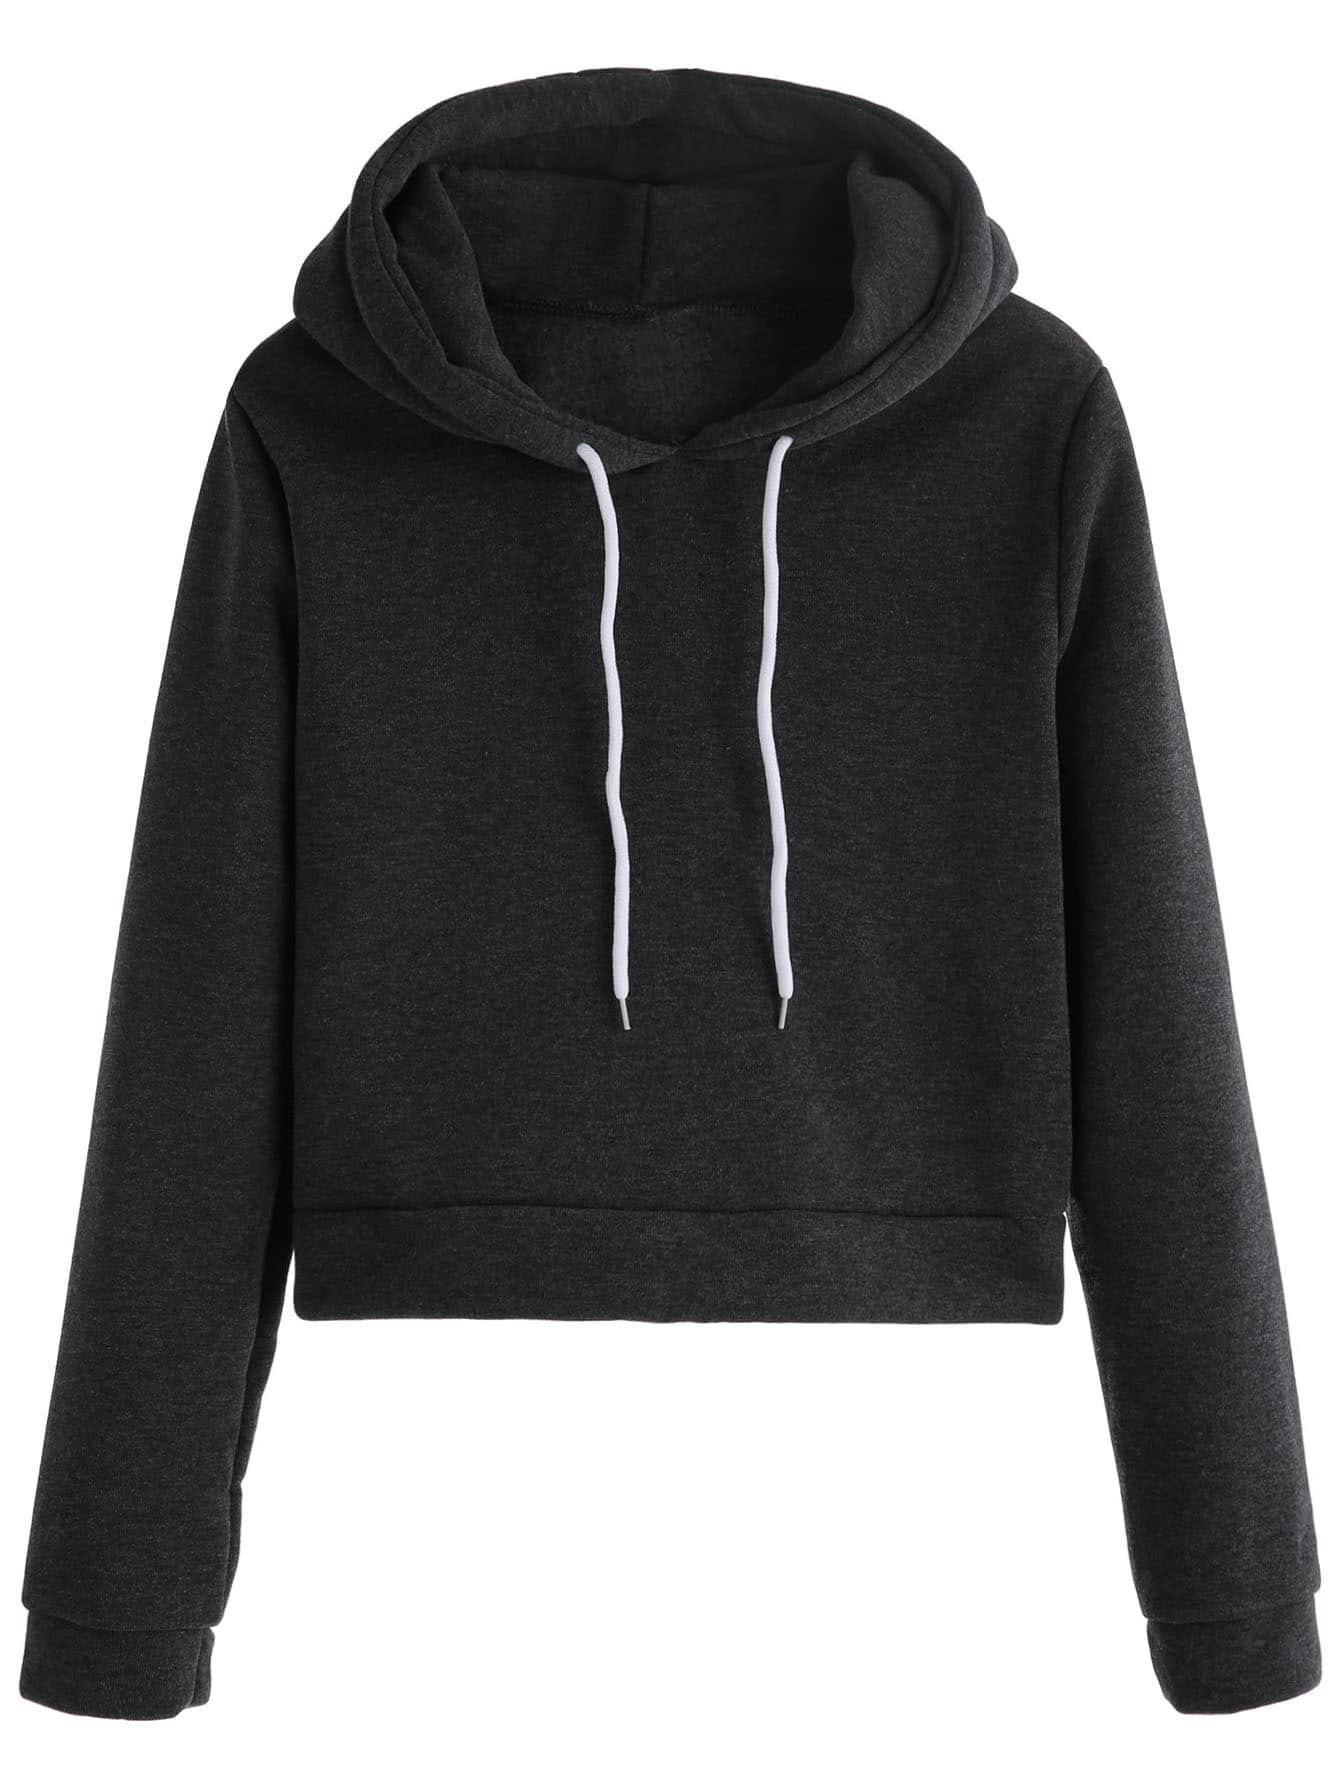 Wholesale Sweatshirts - Bulk Sweatshirts, Hoodies & Zip Up Hoodies.